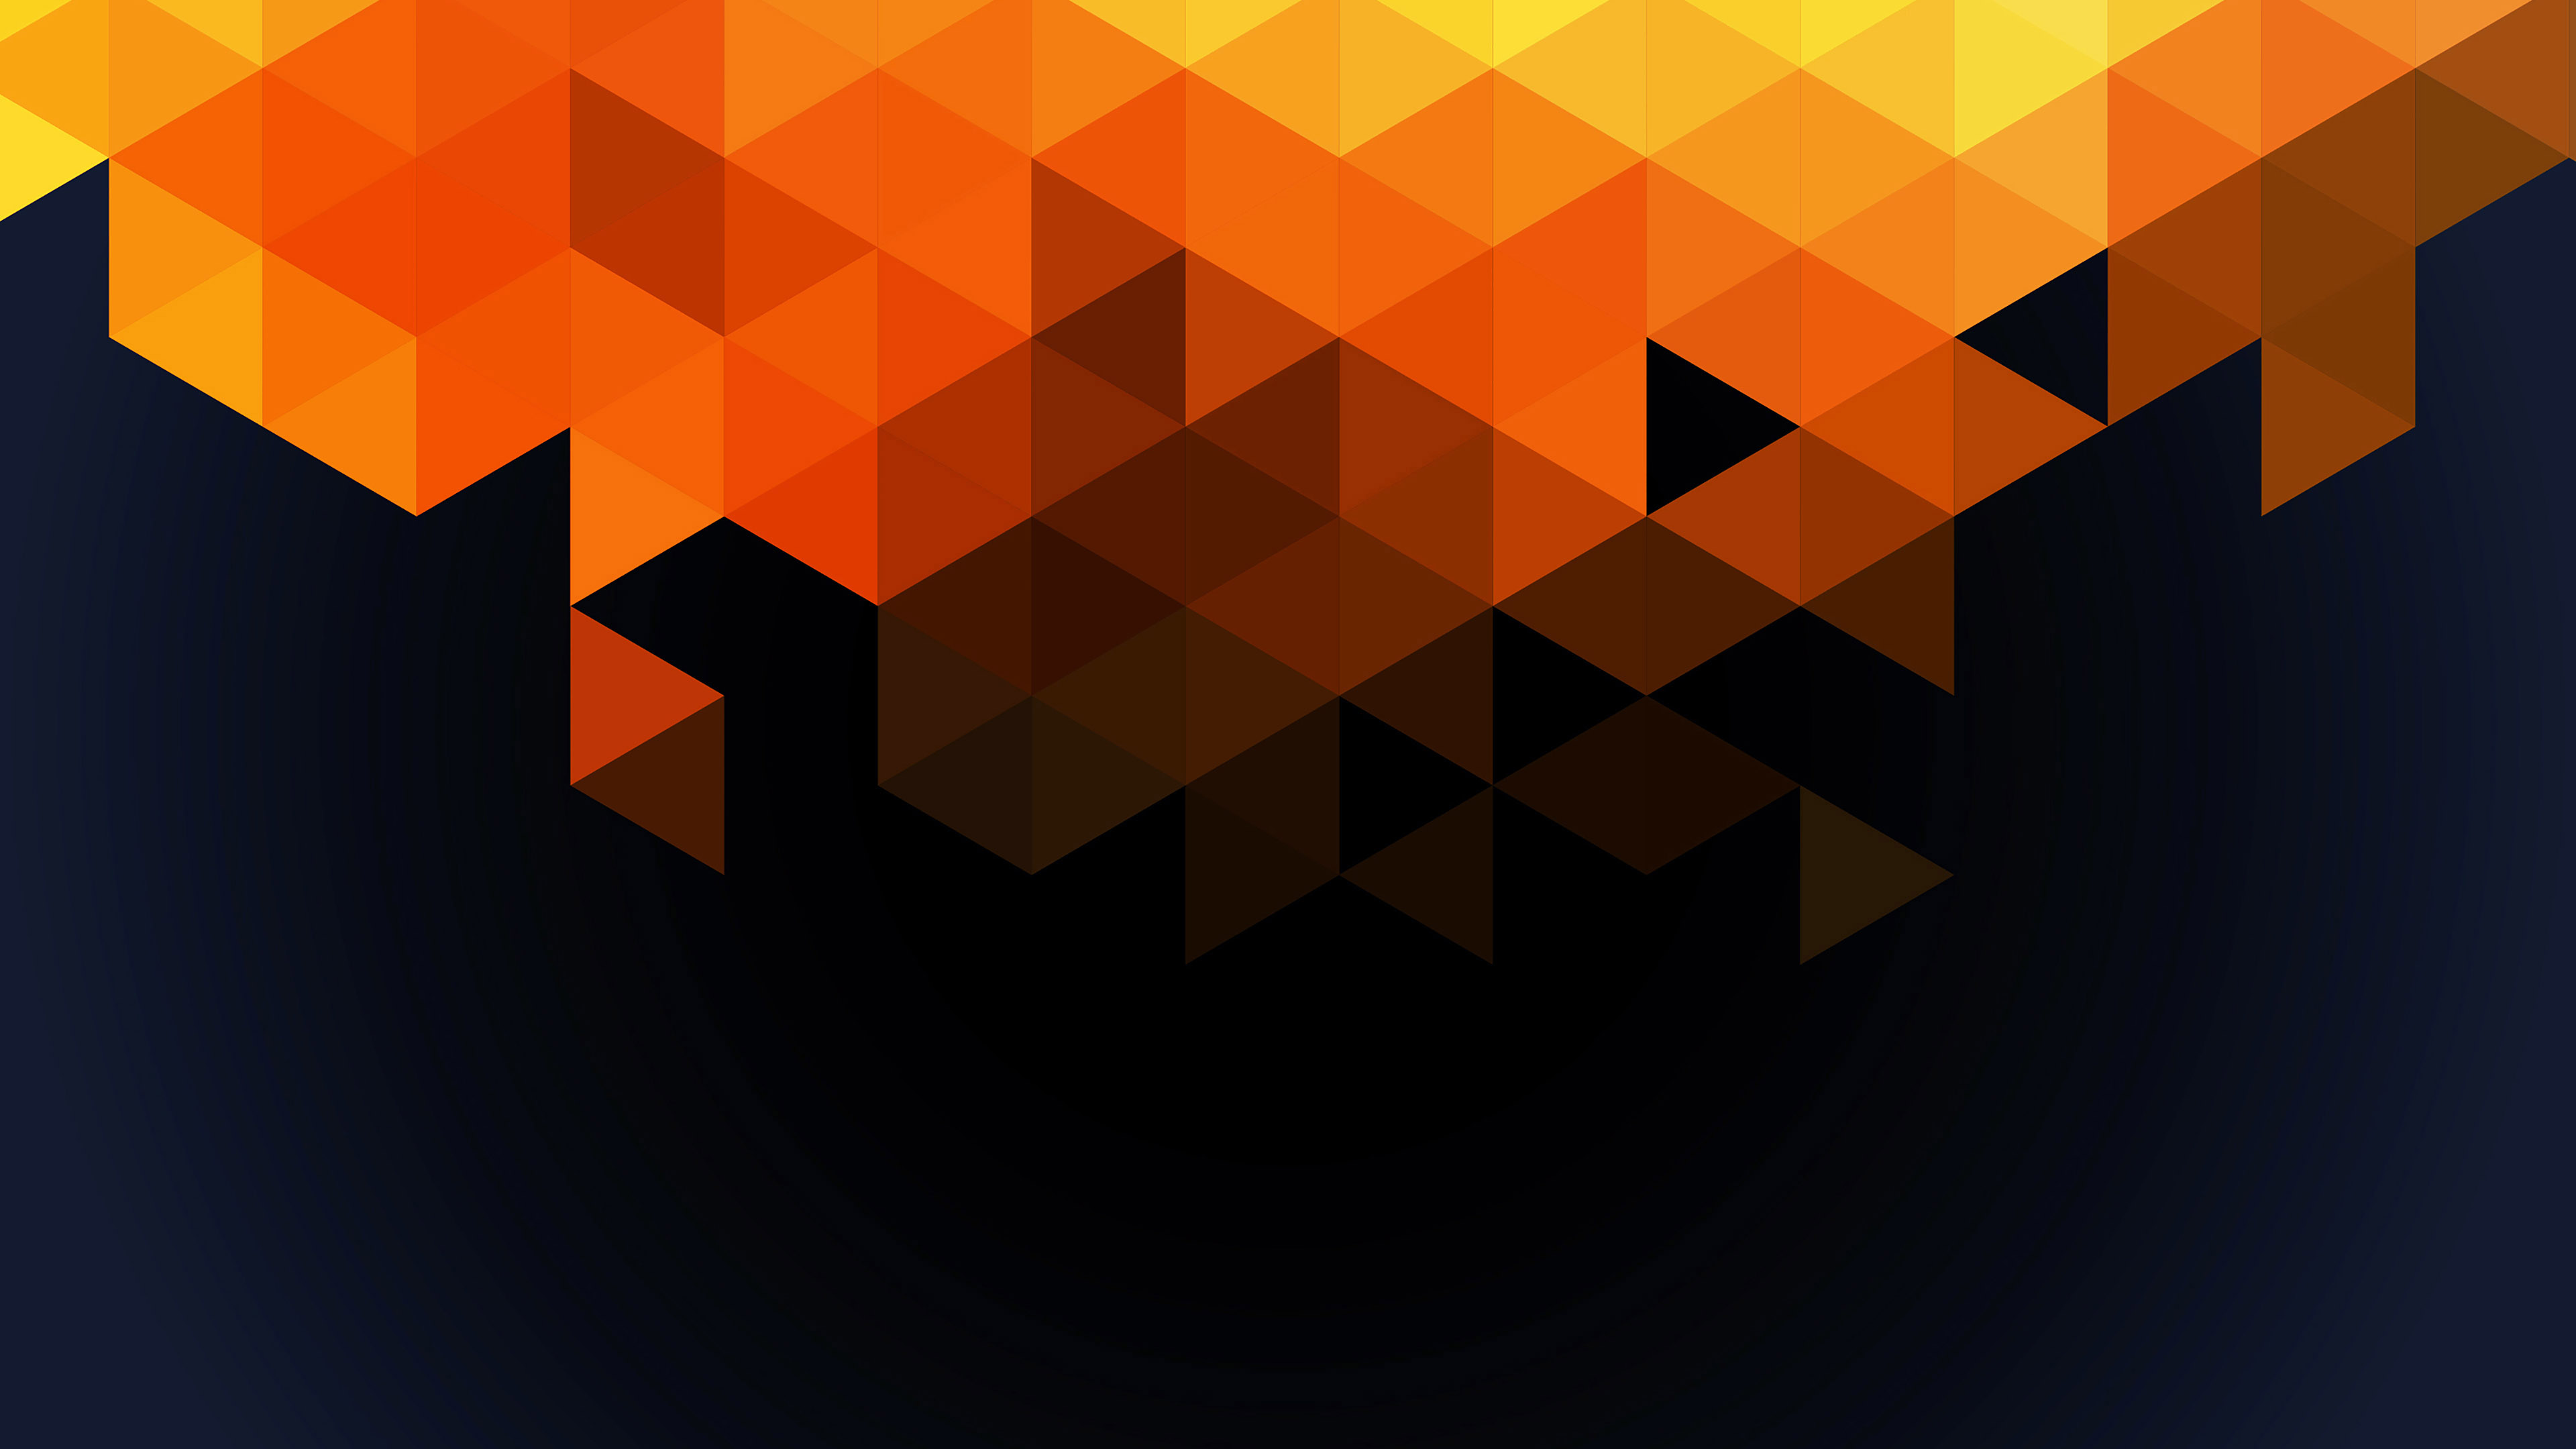 va92-wallpaper-triangle-fall-orange-pattern-wallpaper